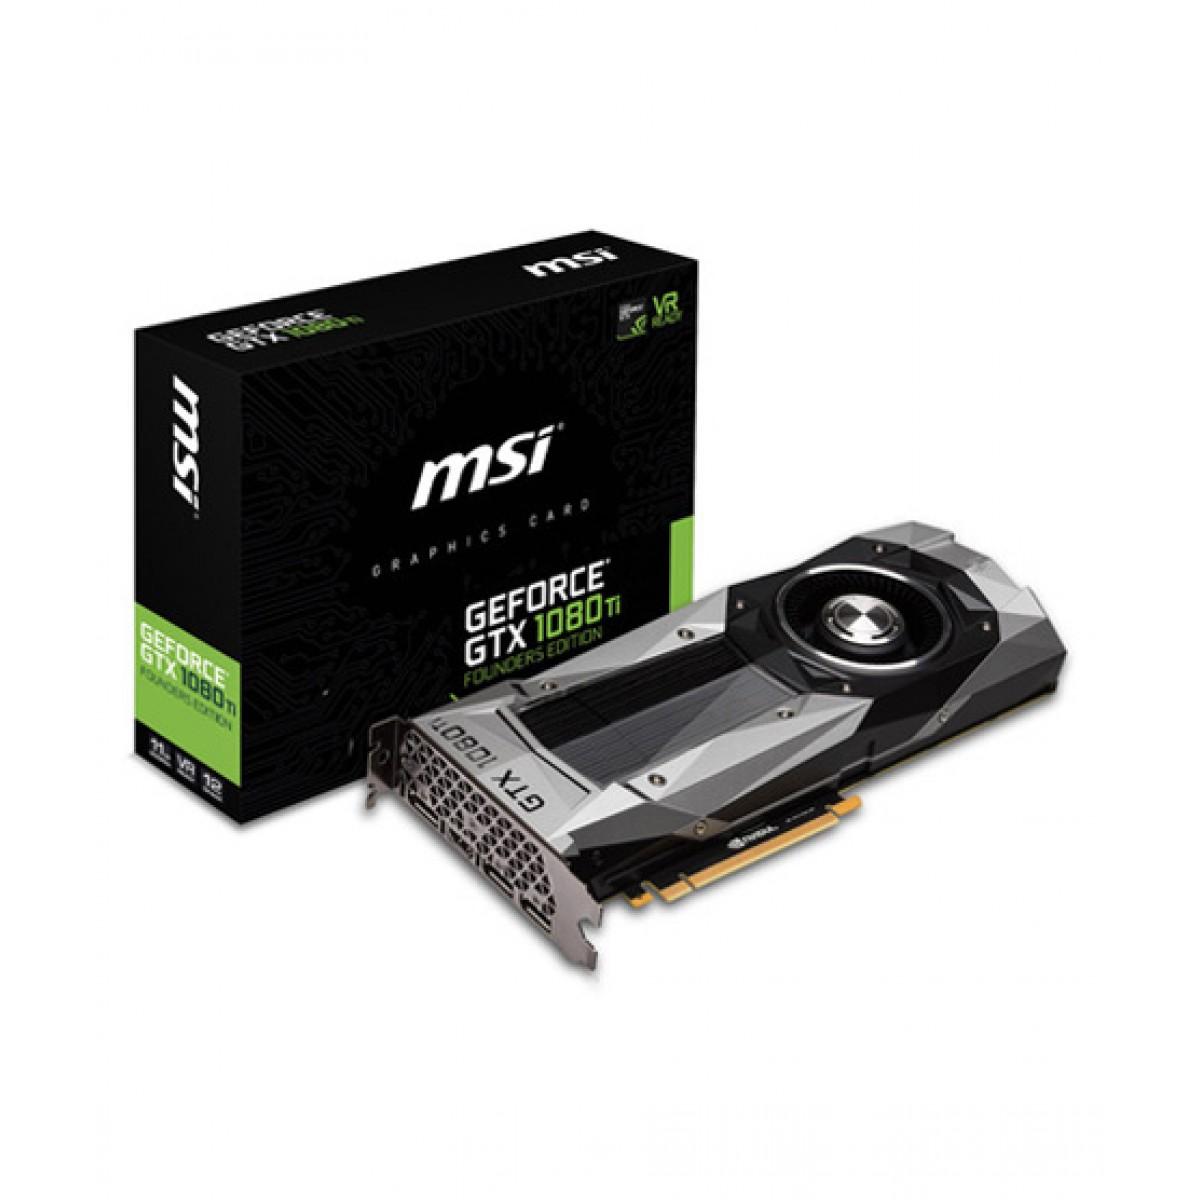 MSI GeForce GTX 1080 Ti Founders Edition 11GB GDDR5X Graphics Card